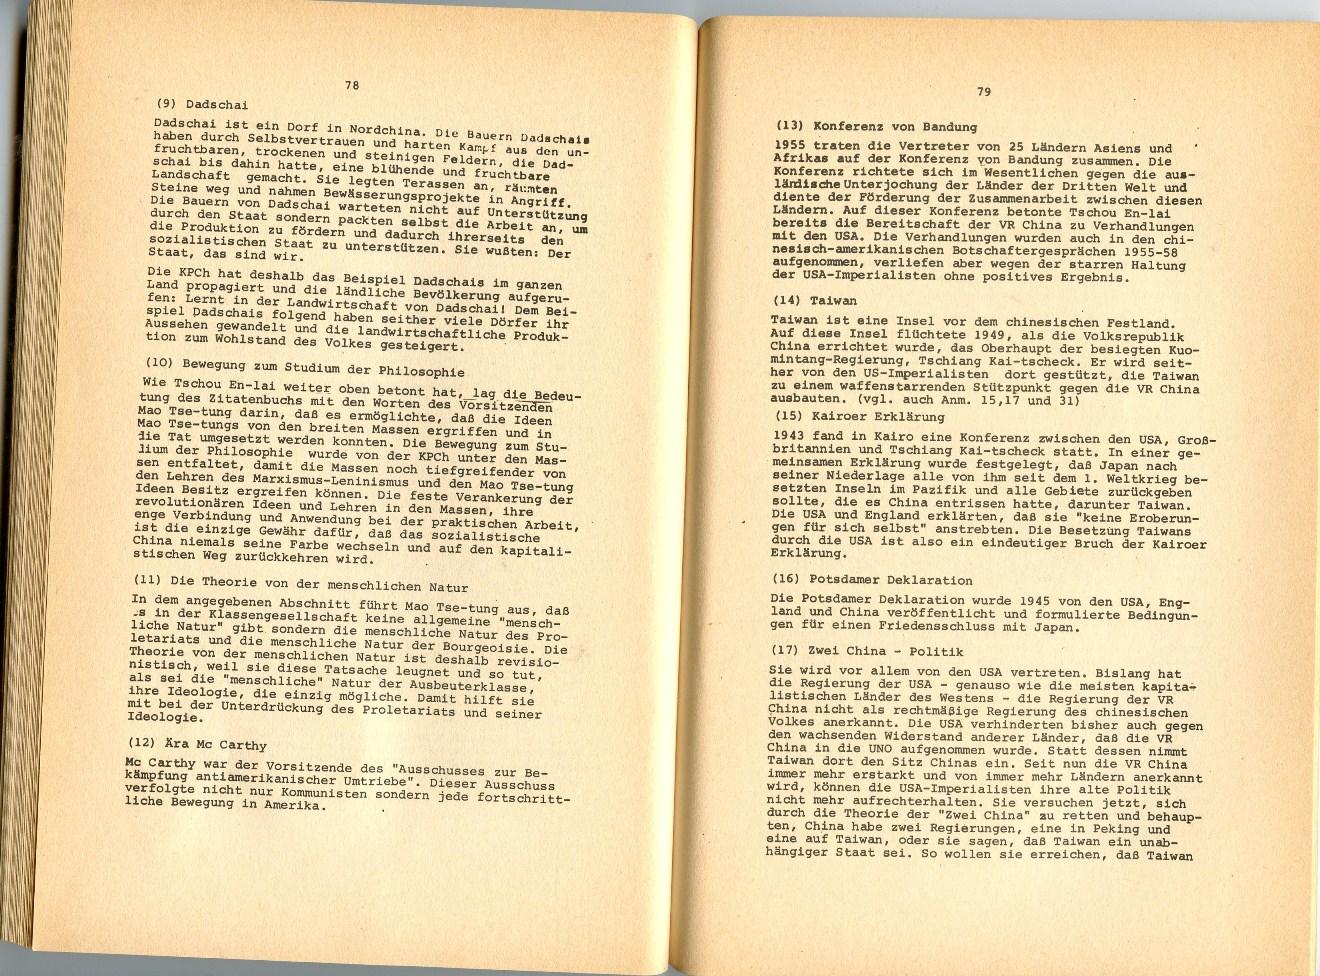 ZB_VRChina_Bollwerk_1971_41